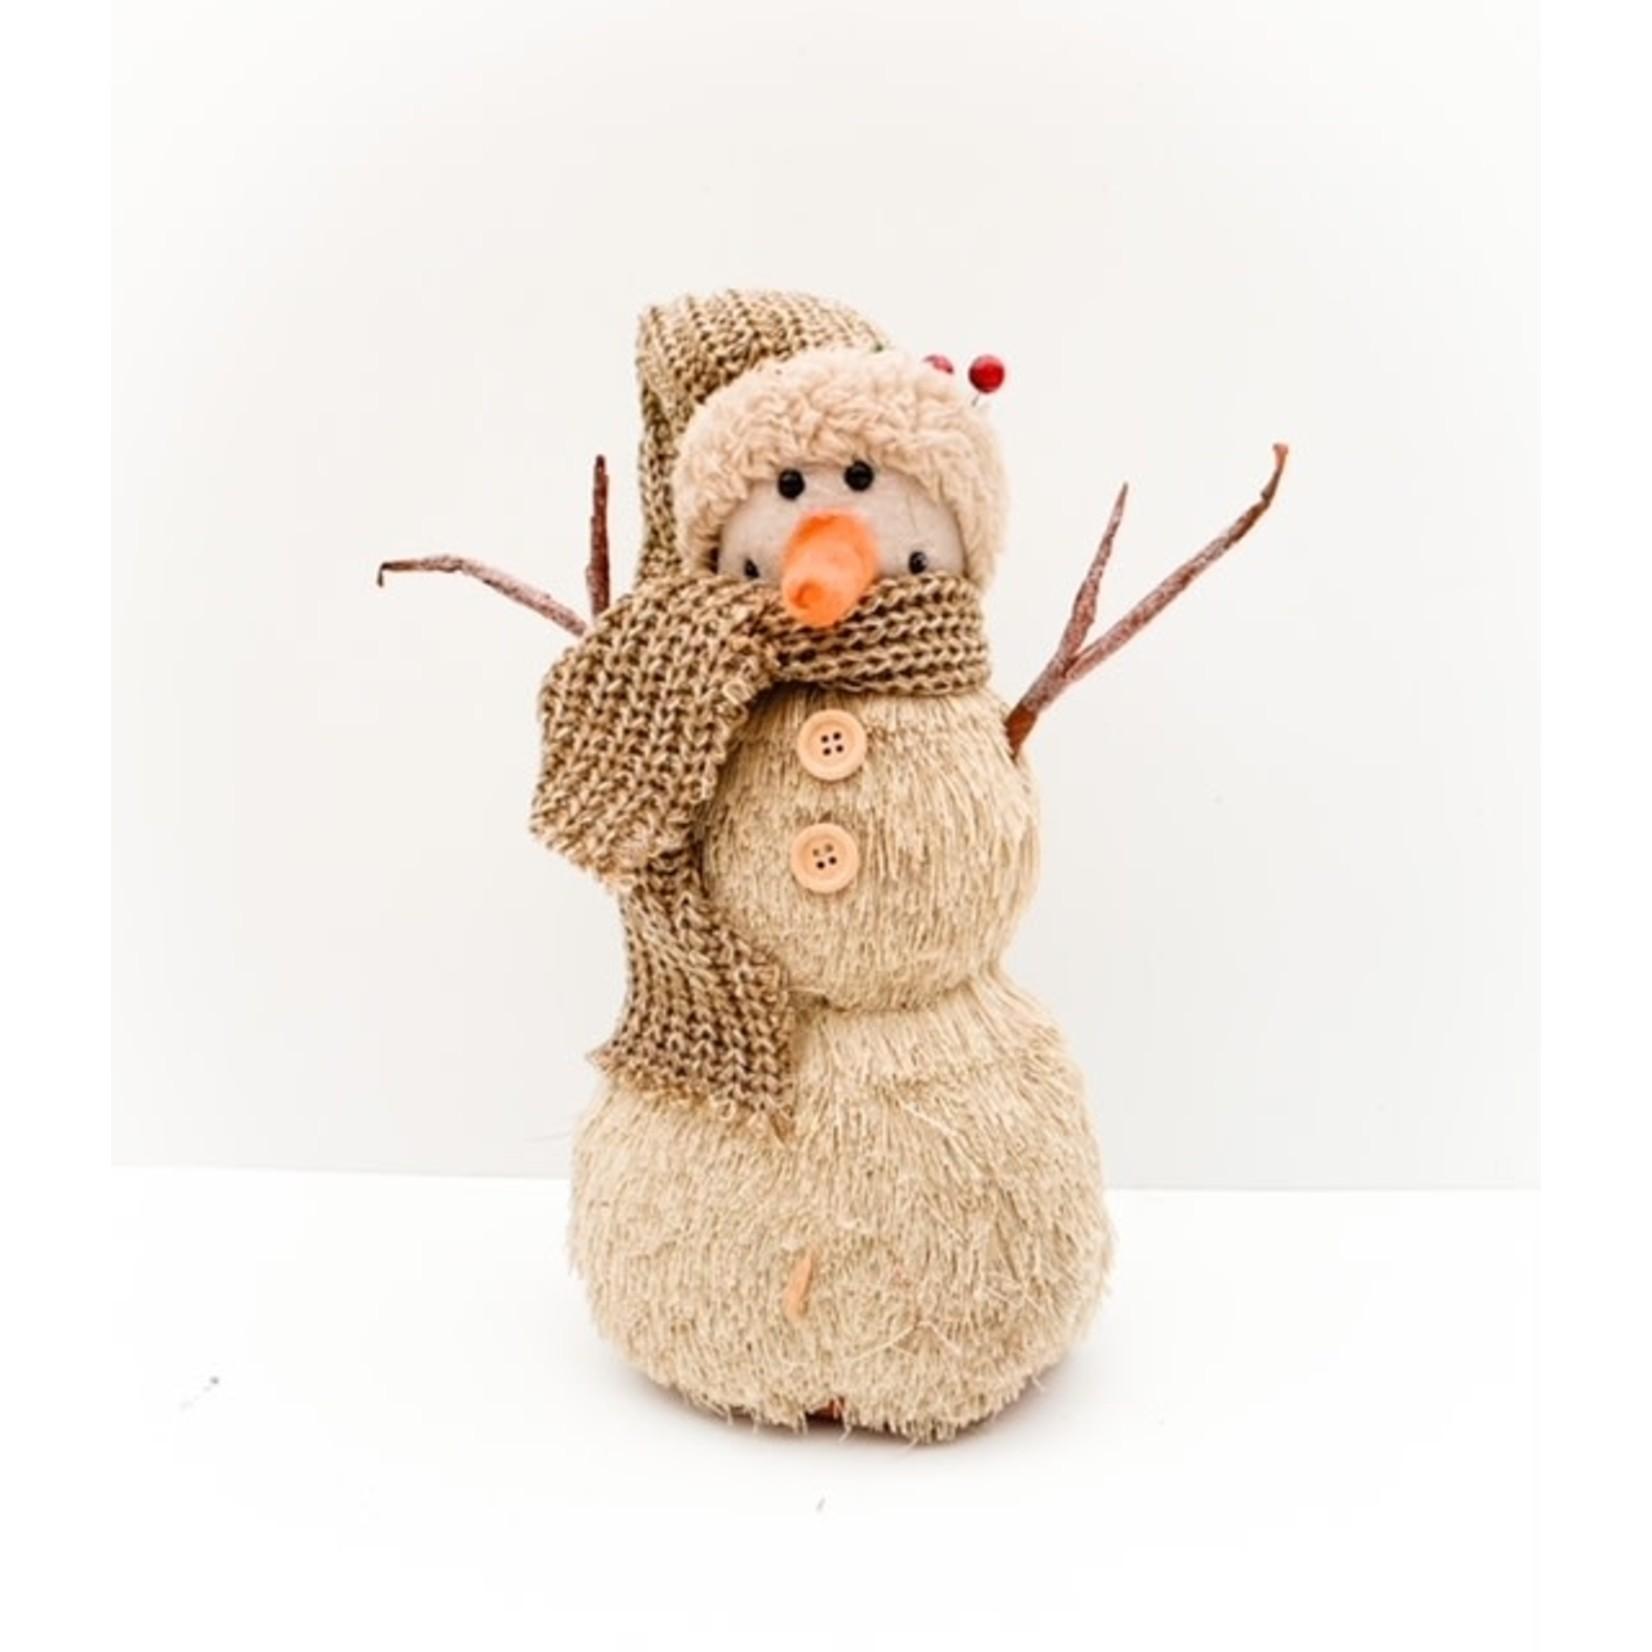 Snowman - Cream/White